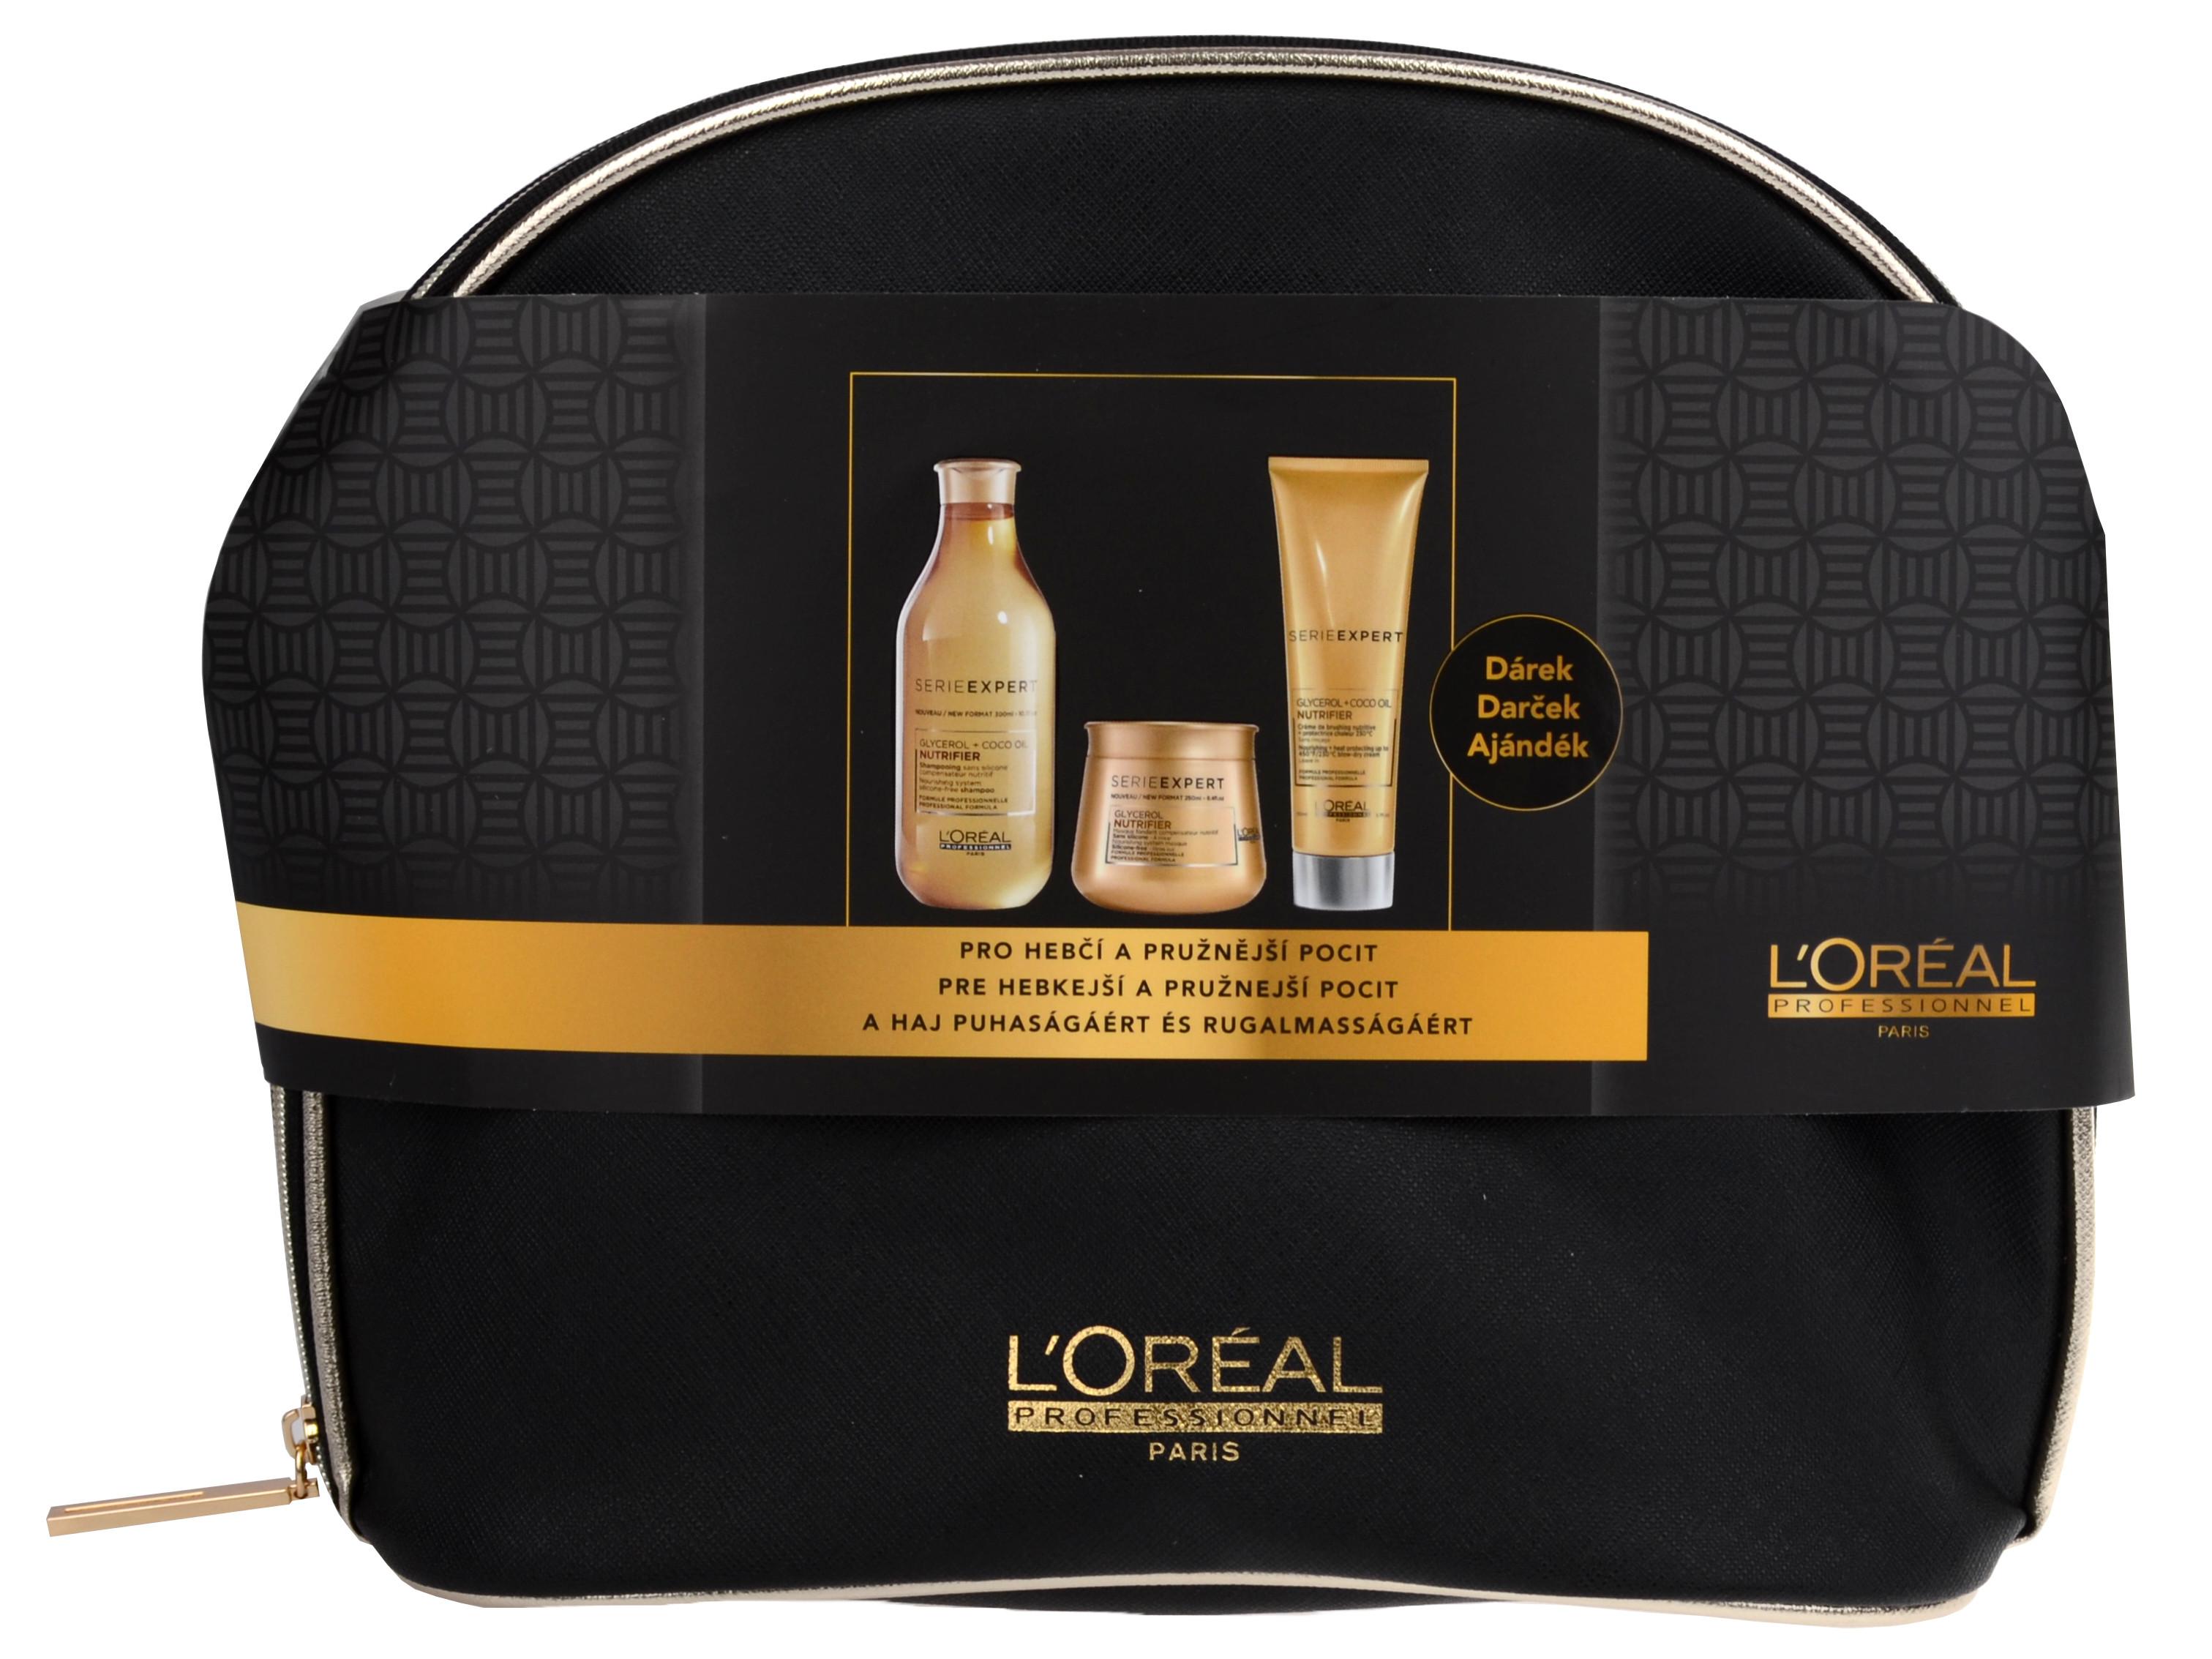 Loréal Professionnel Expert Nutrifier Set - šampon na suché vlasy 300ml + vyživující maska na suché vlasy 250ml + termoochranný krém 150ml + neceser